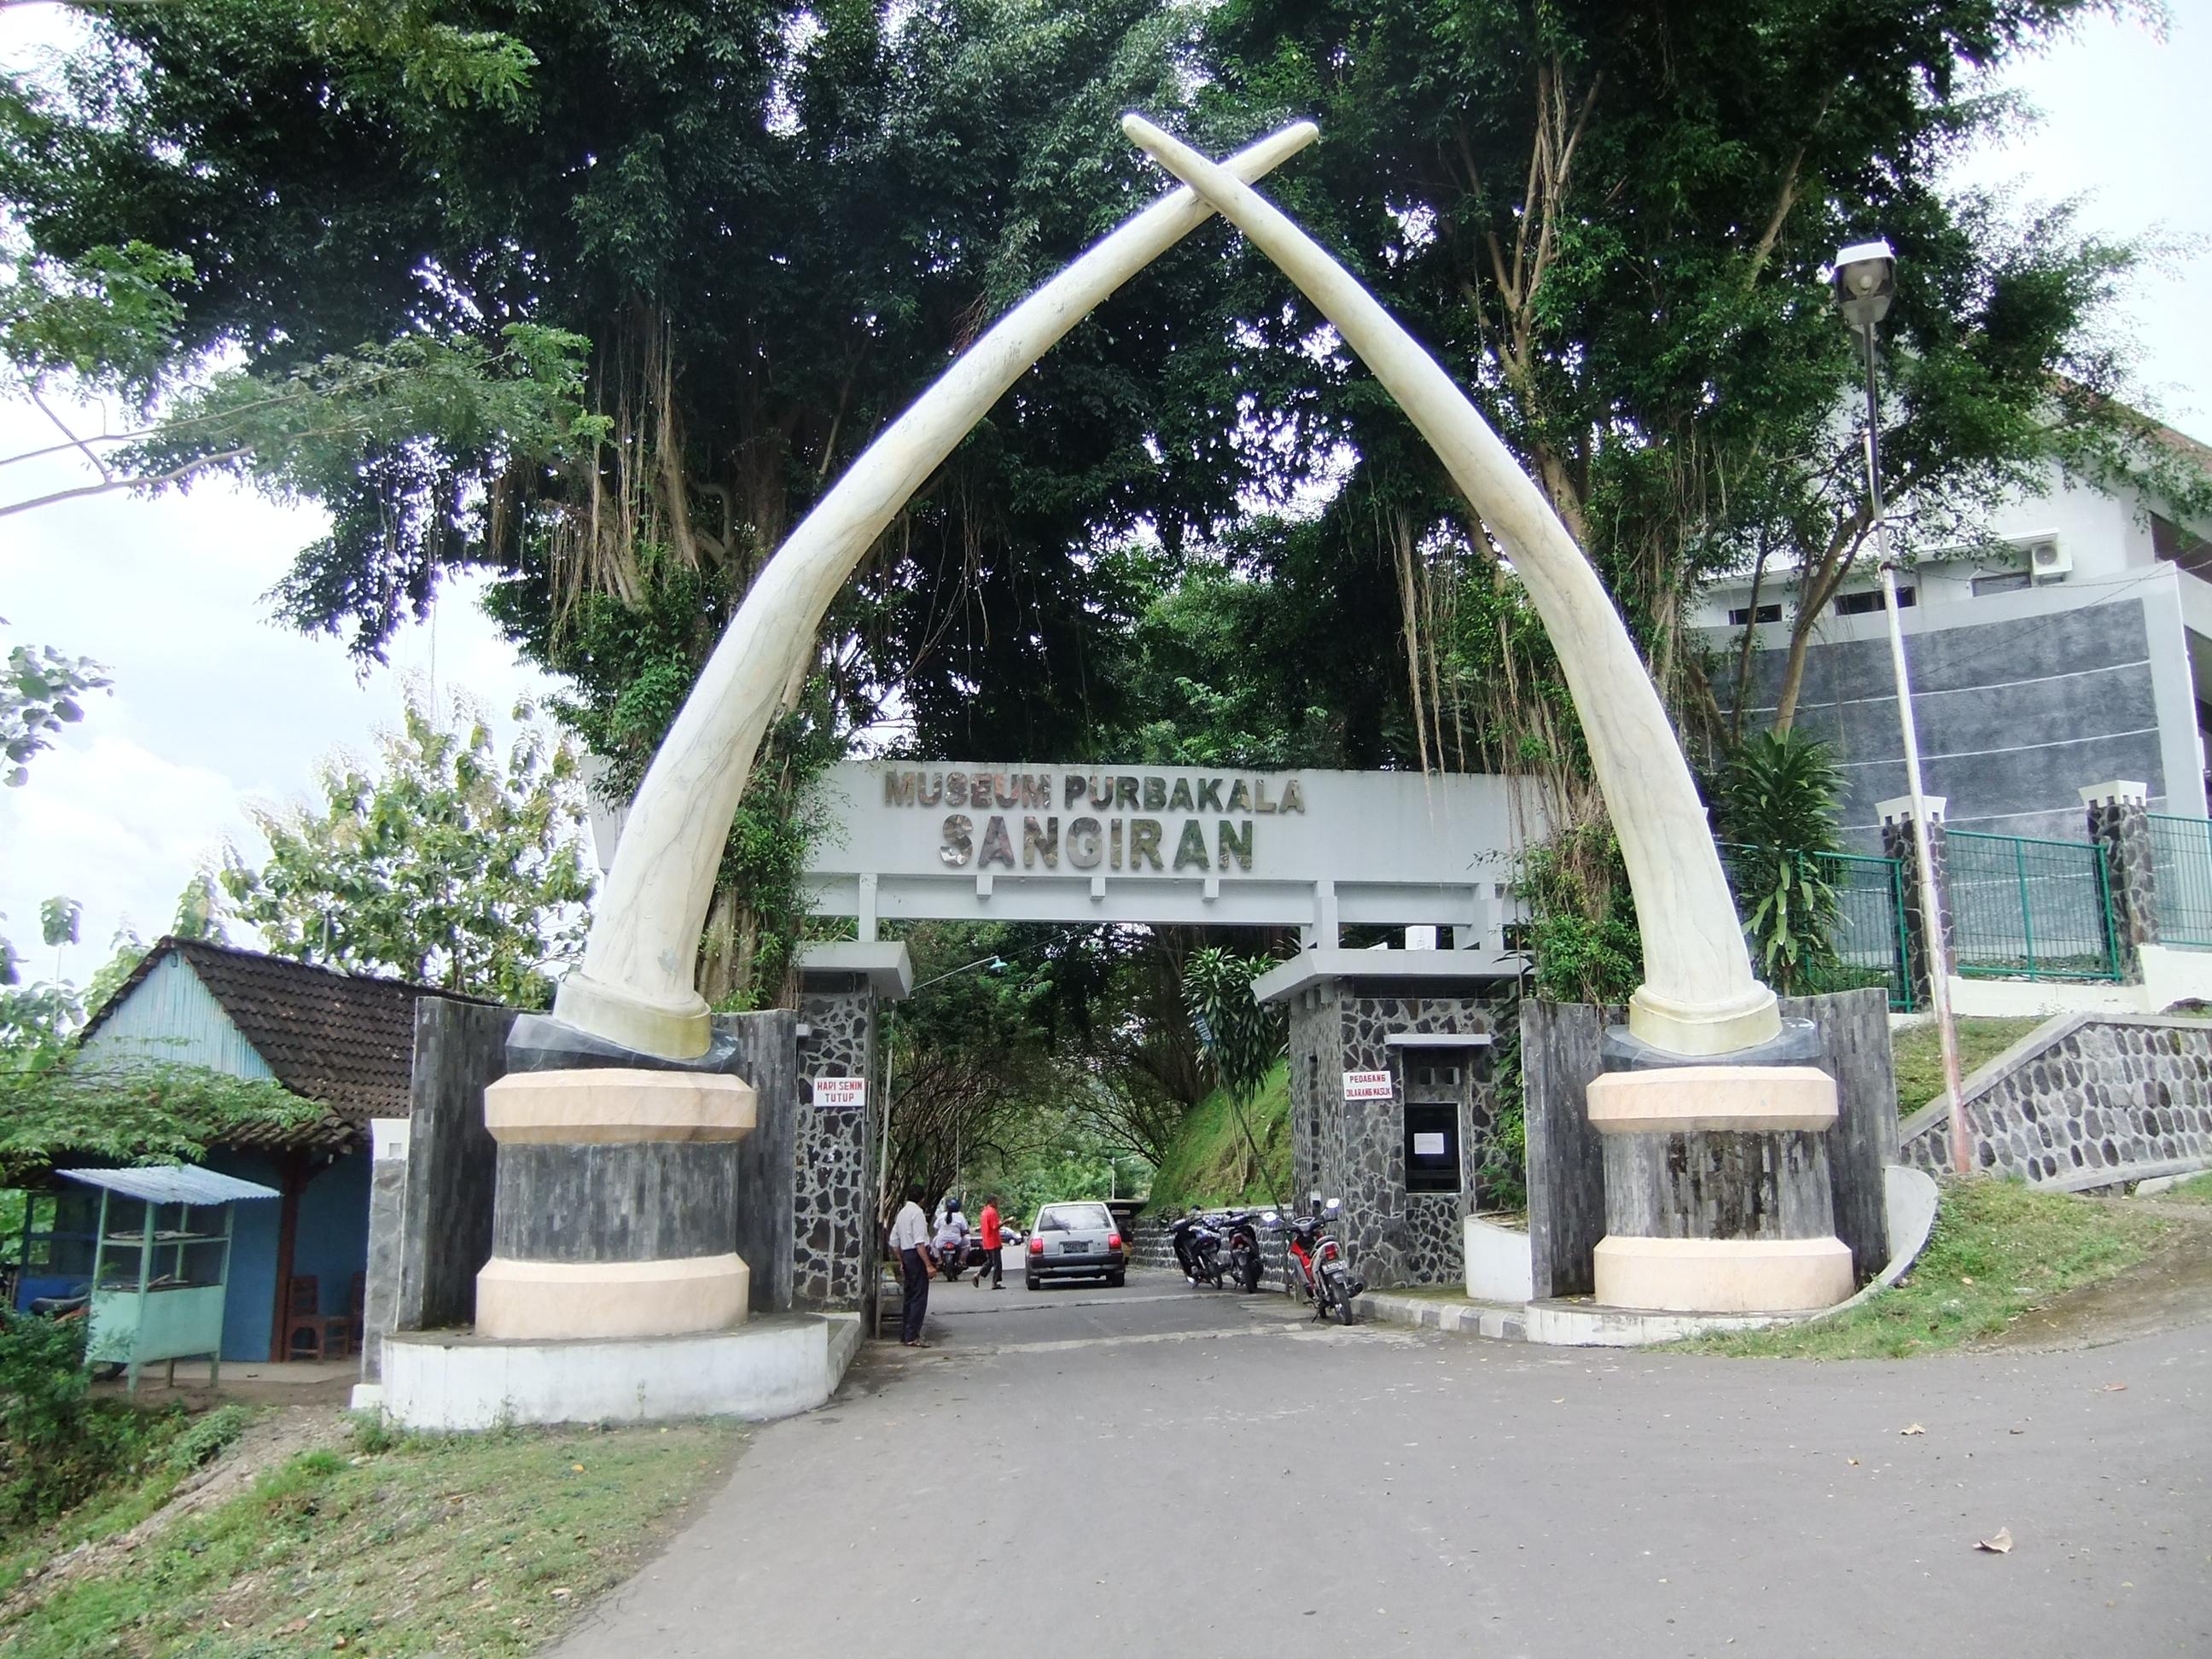 Museum Fosil Sangiran Wikipedia Bahasa Indonesia Ensiklopedia Bebas Purbakala 1